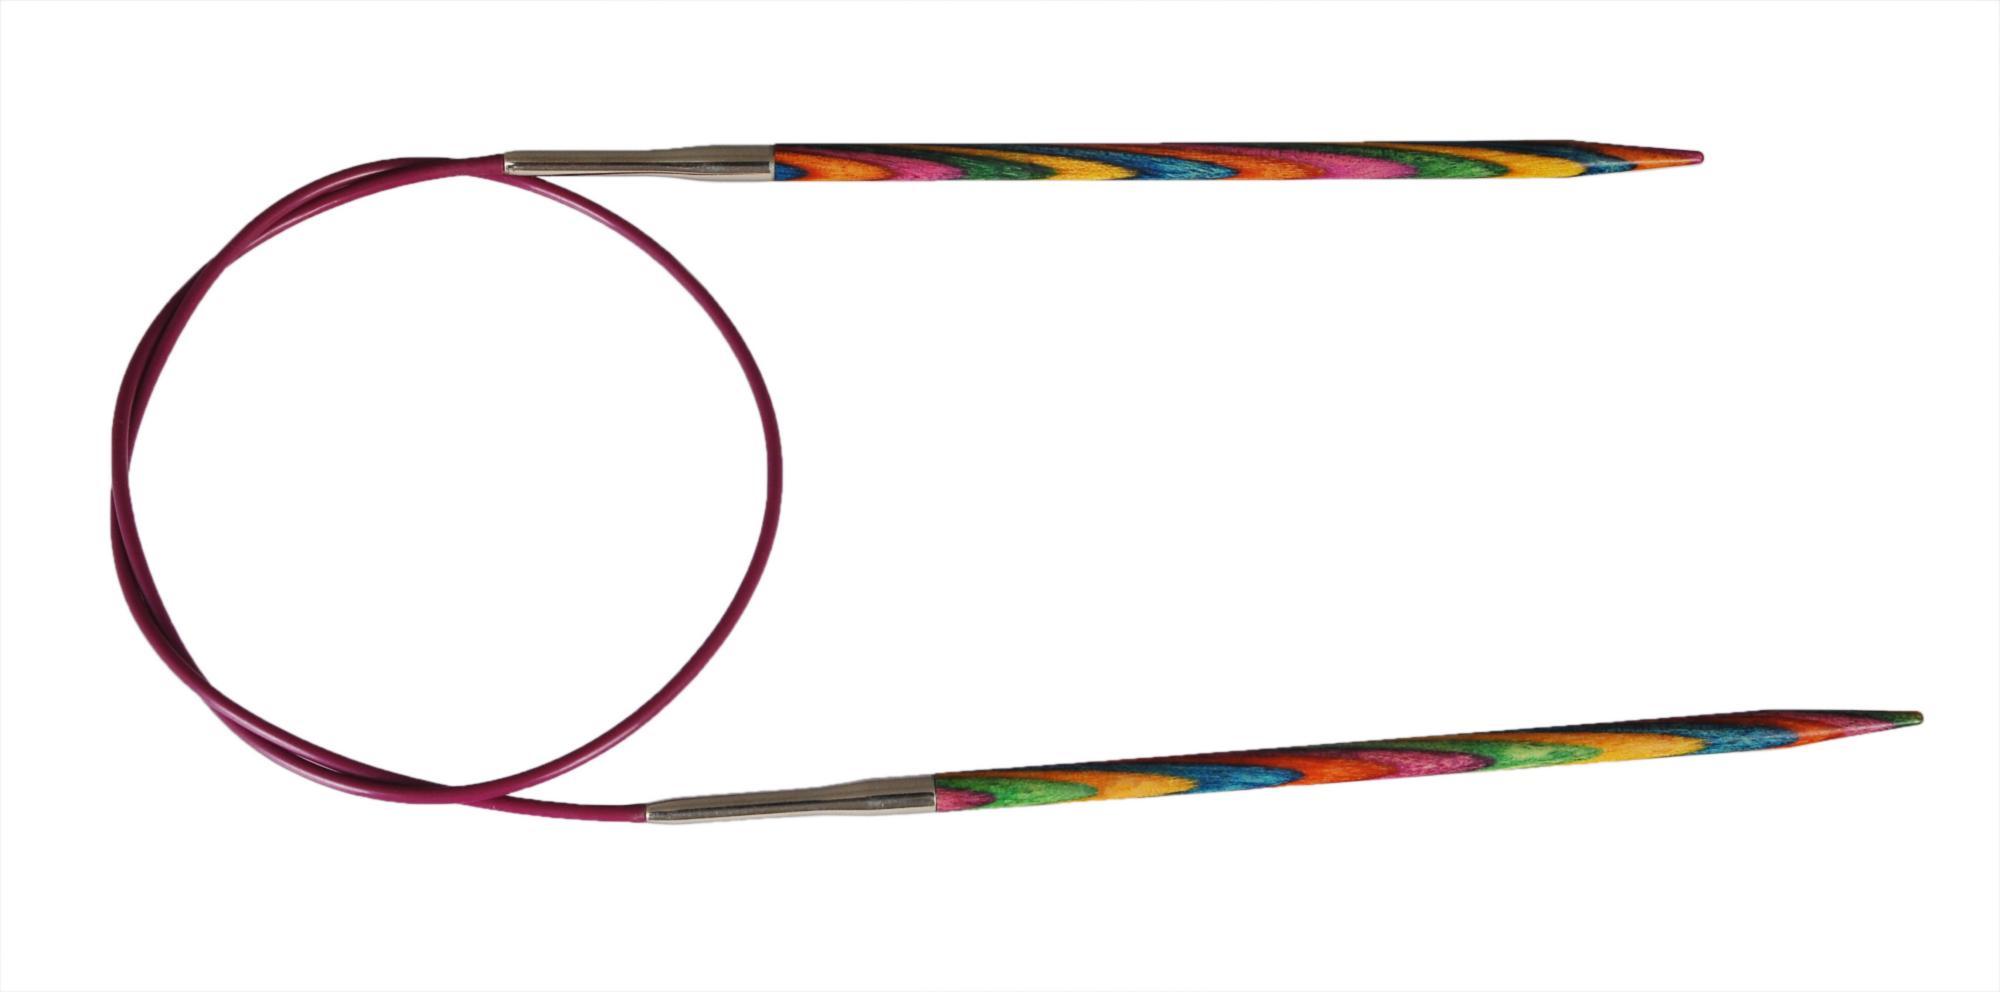 Спицы круговые 50 см Symfonie Wood KnitPro, 20398, 9.00 мм